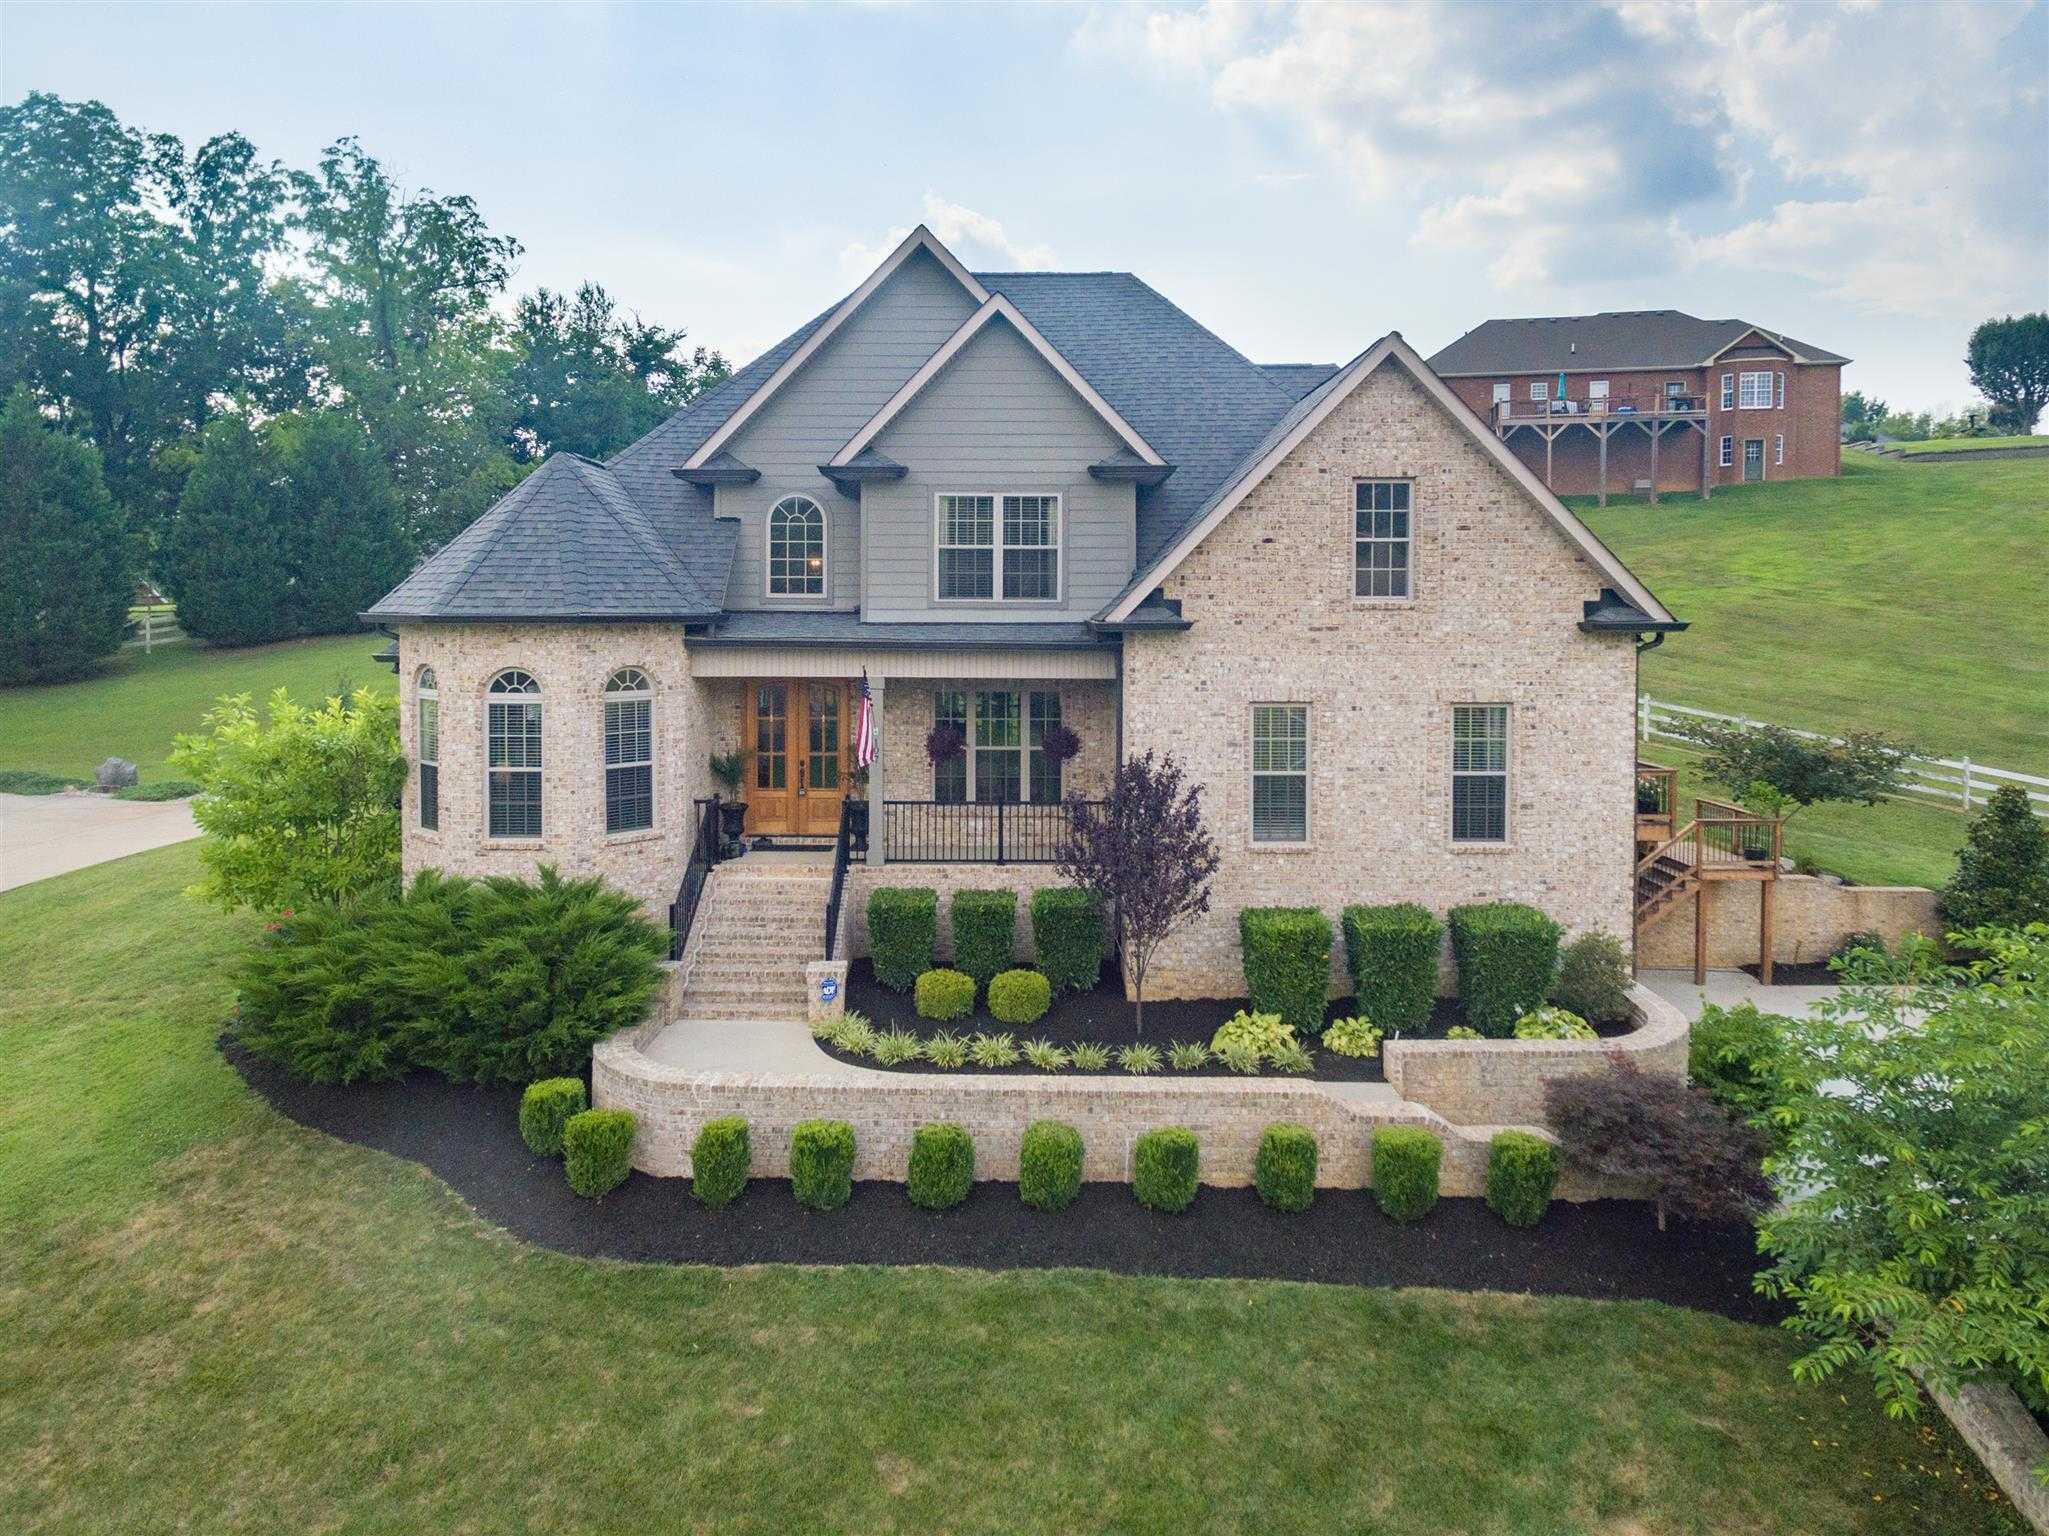 $549,900 - 4Br/4Ba -  for Sale in Mooreland Est Sec 8b, Springfield